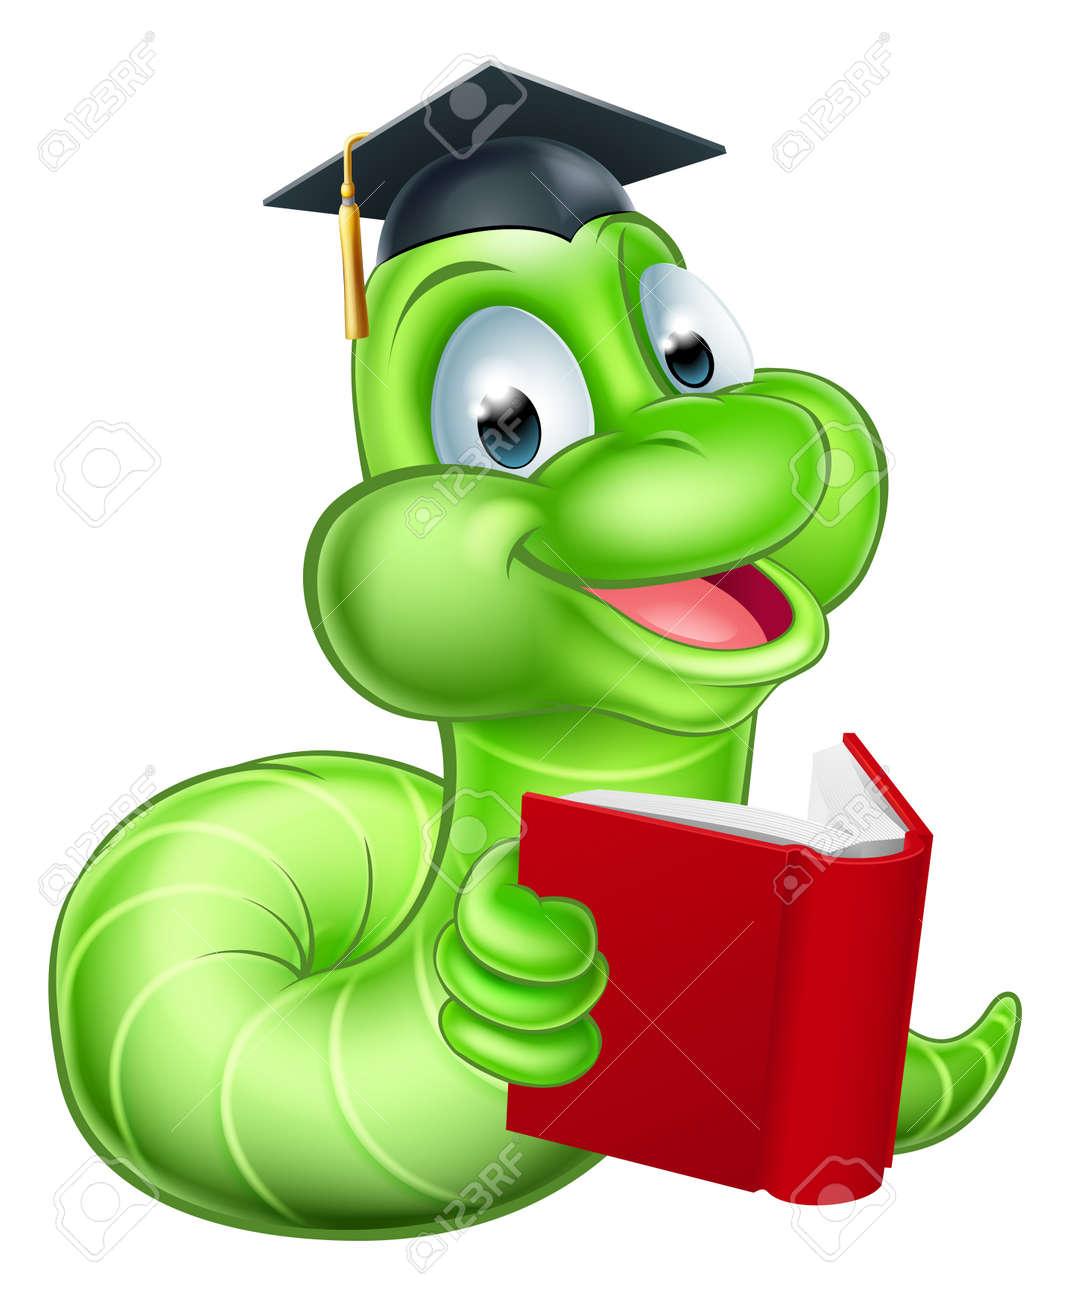 Cute smiling green cartoon caterpillar worm bookworm mascot reading a book and wearing mortar board graduation hat - 42462659